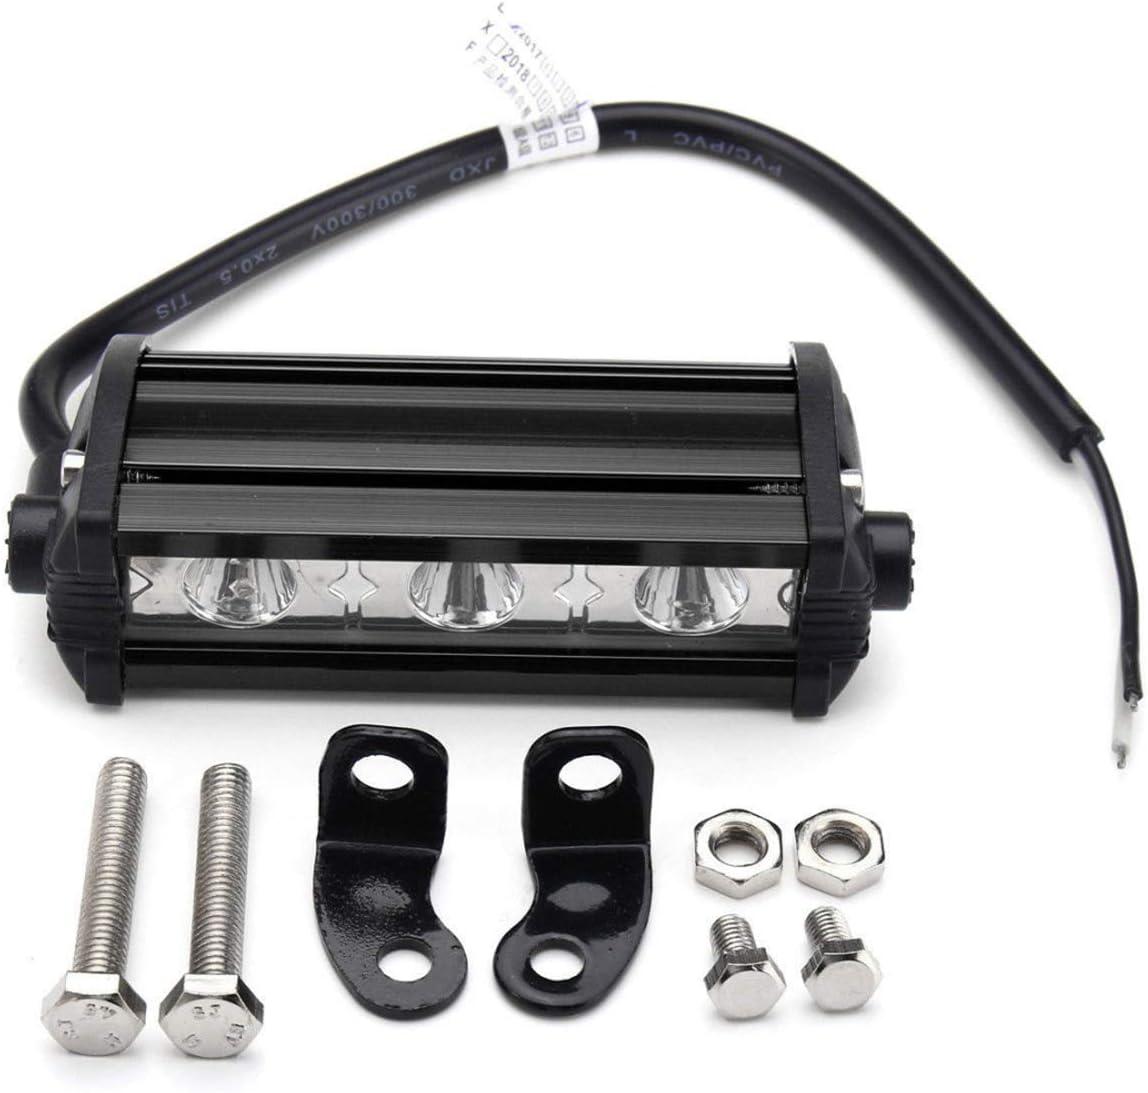 Willpower 4 Inch 15W Single Row LED Light Bar Low Profile Ultra Thin Slim Mini Spotlight Light for SUV ATV Truck Boat